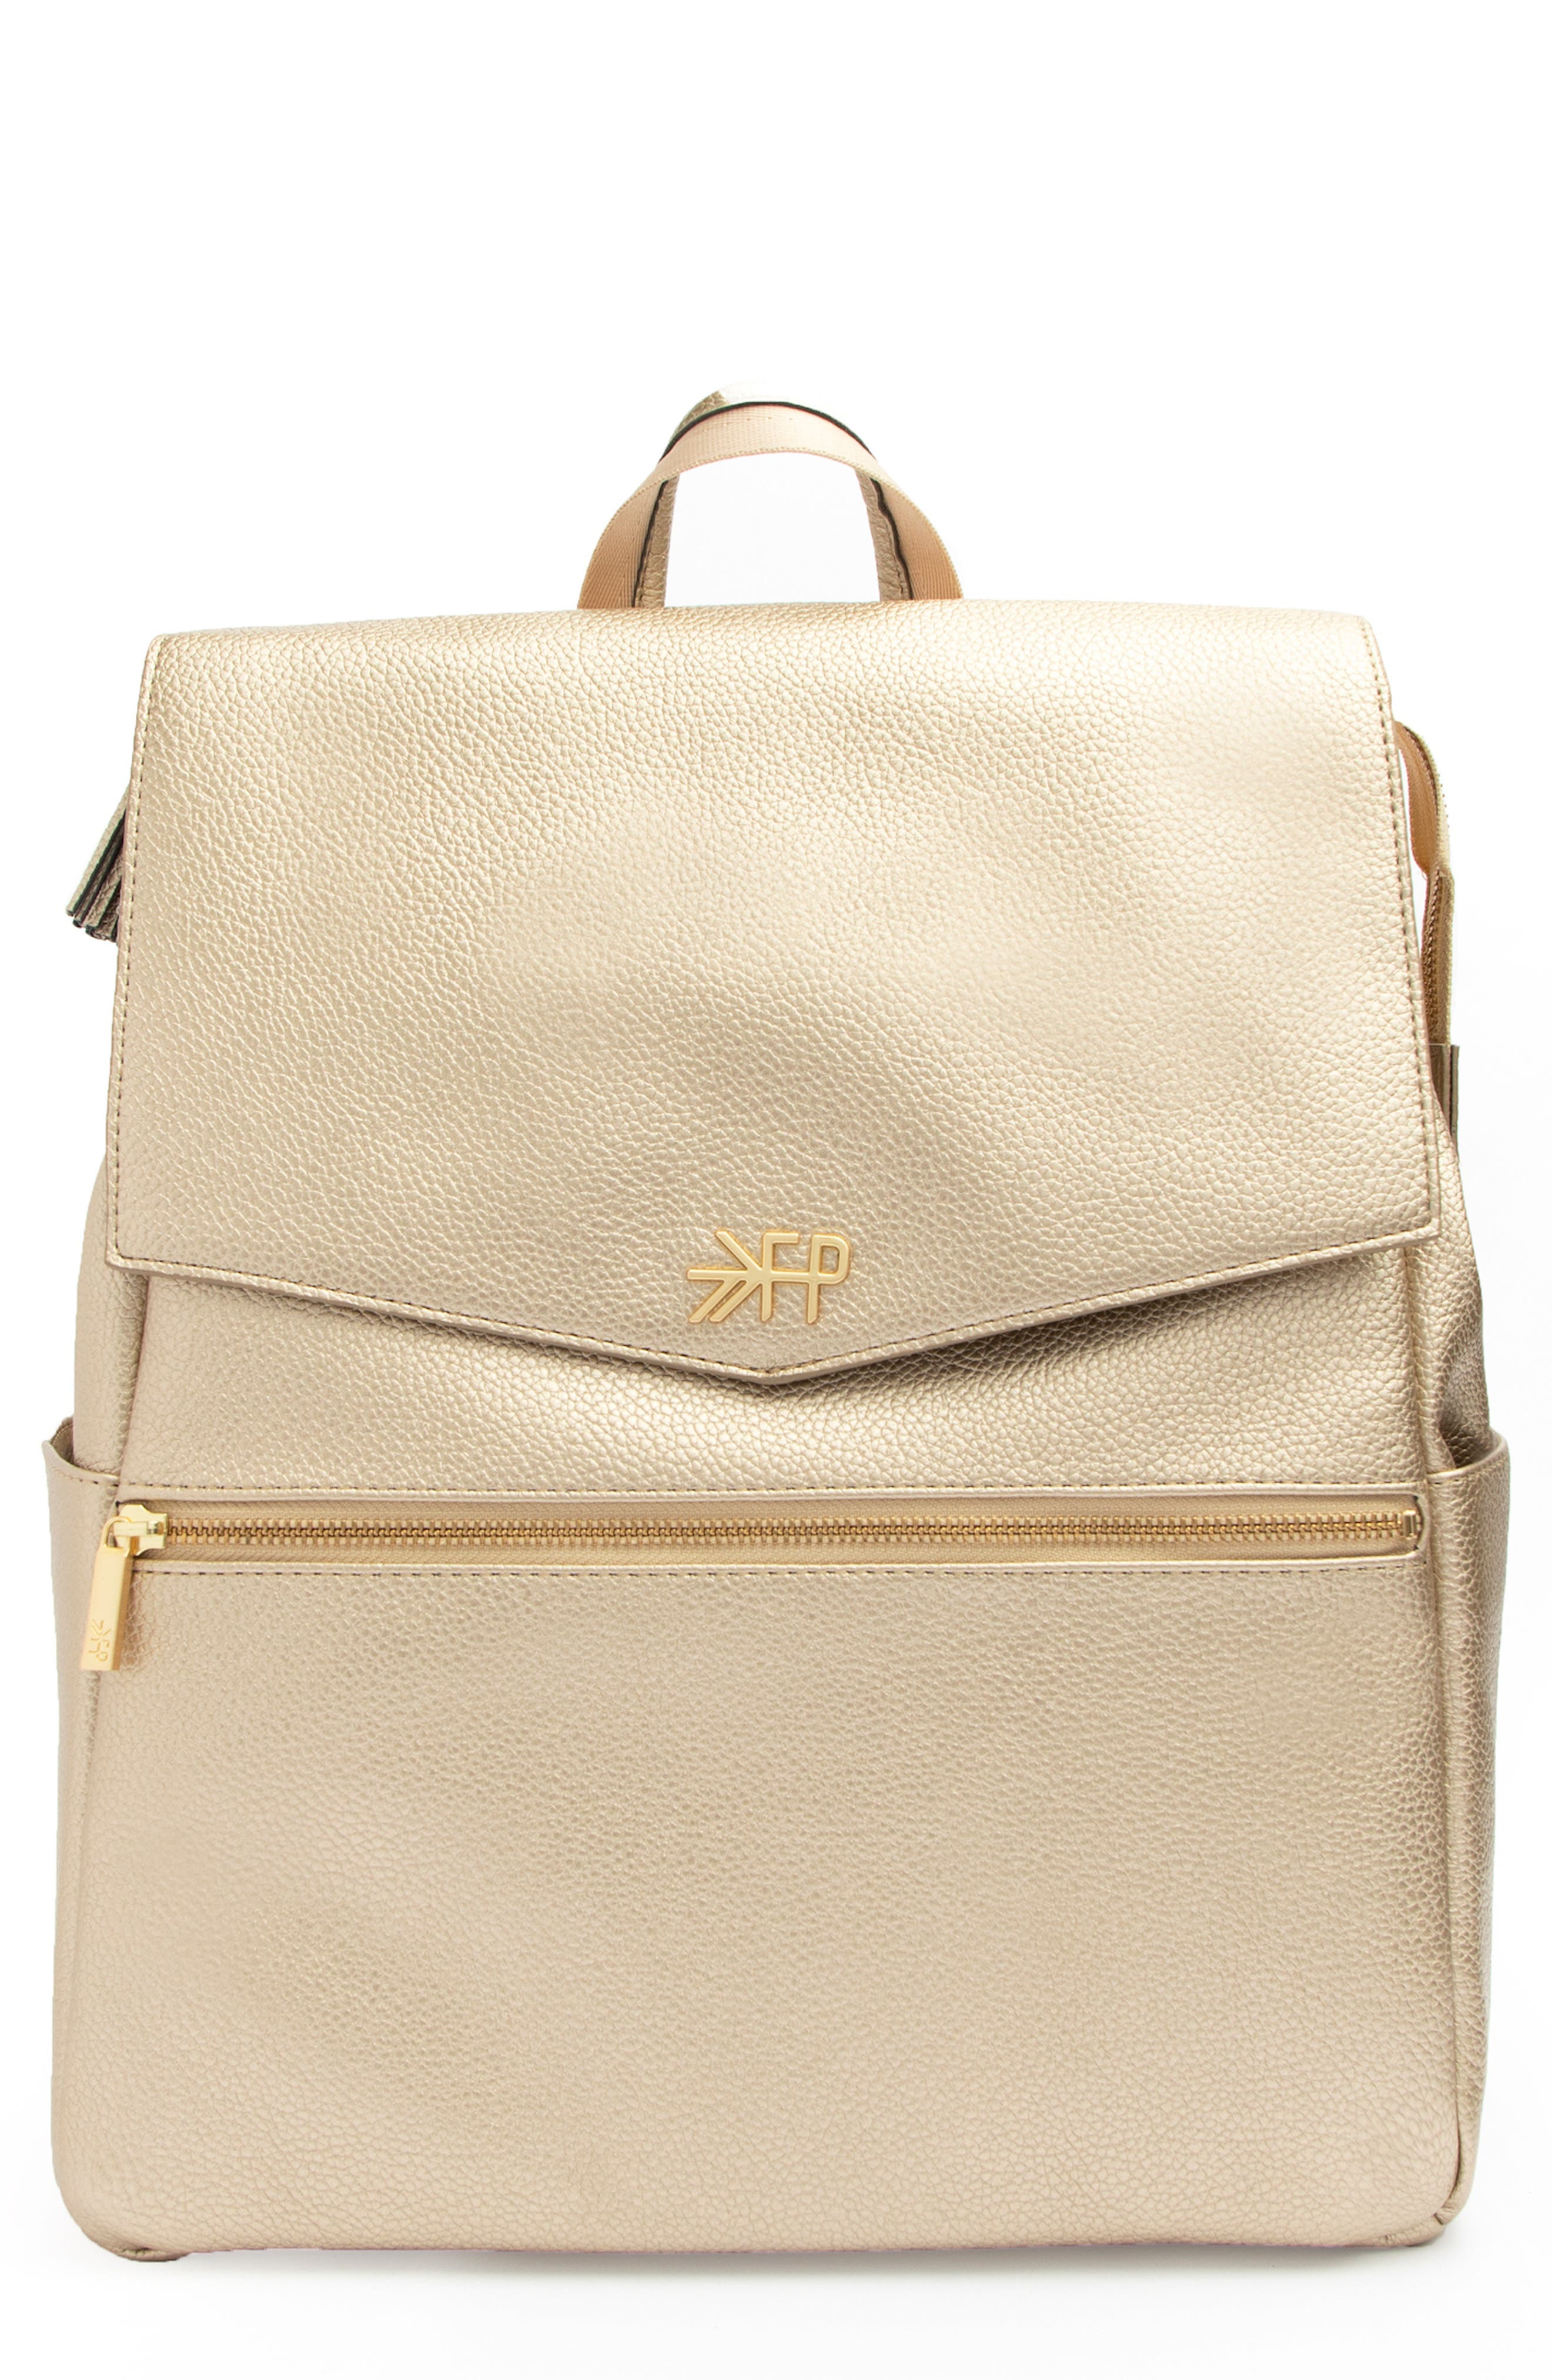 FRESHLY PICKED Convertible Diaper Backpack, Main, color, PLATINUM METALLIC